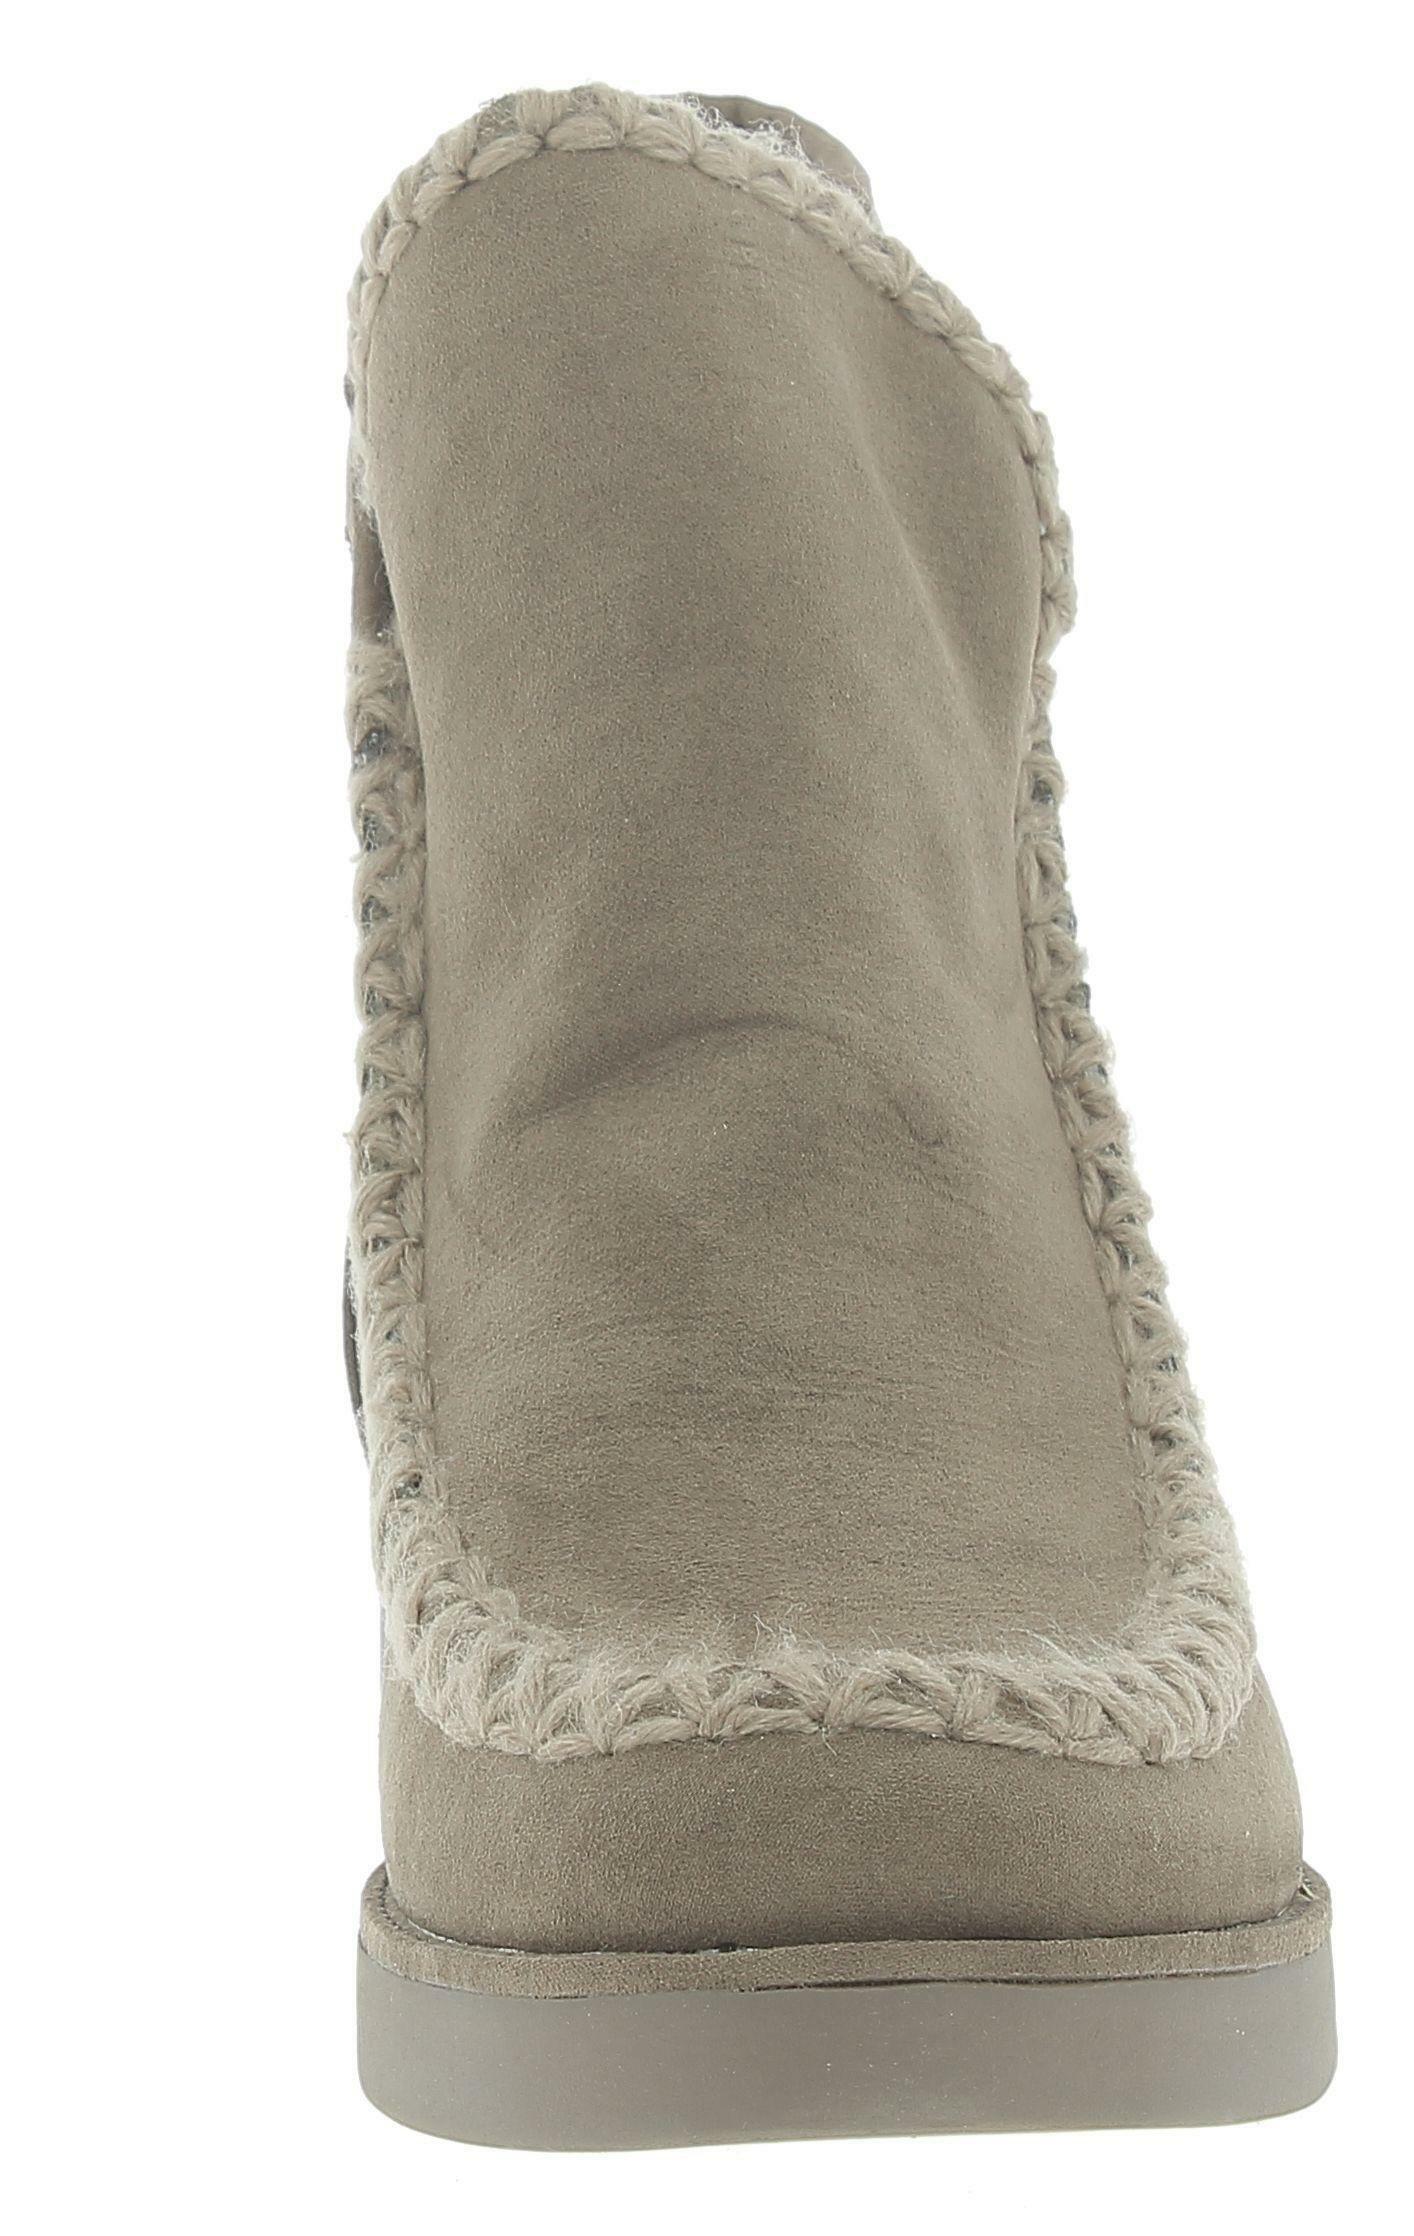 Wrangler axel knitted stivaletto donna marrone